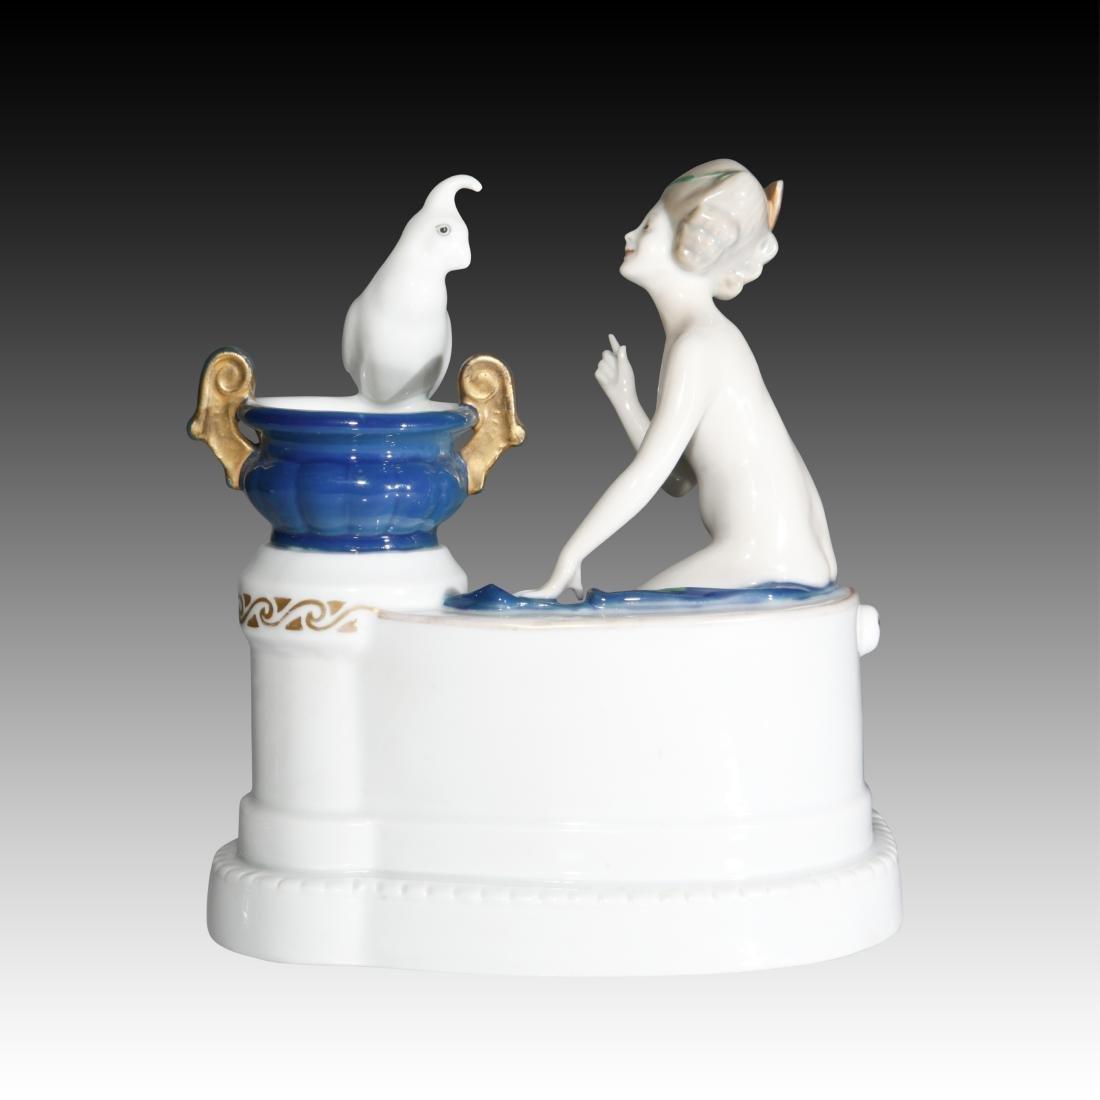 Rosenthal Figurine Nude Venus with Parrot - 3